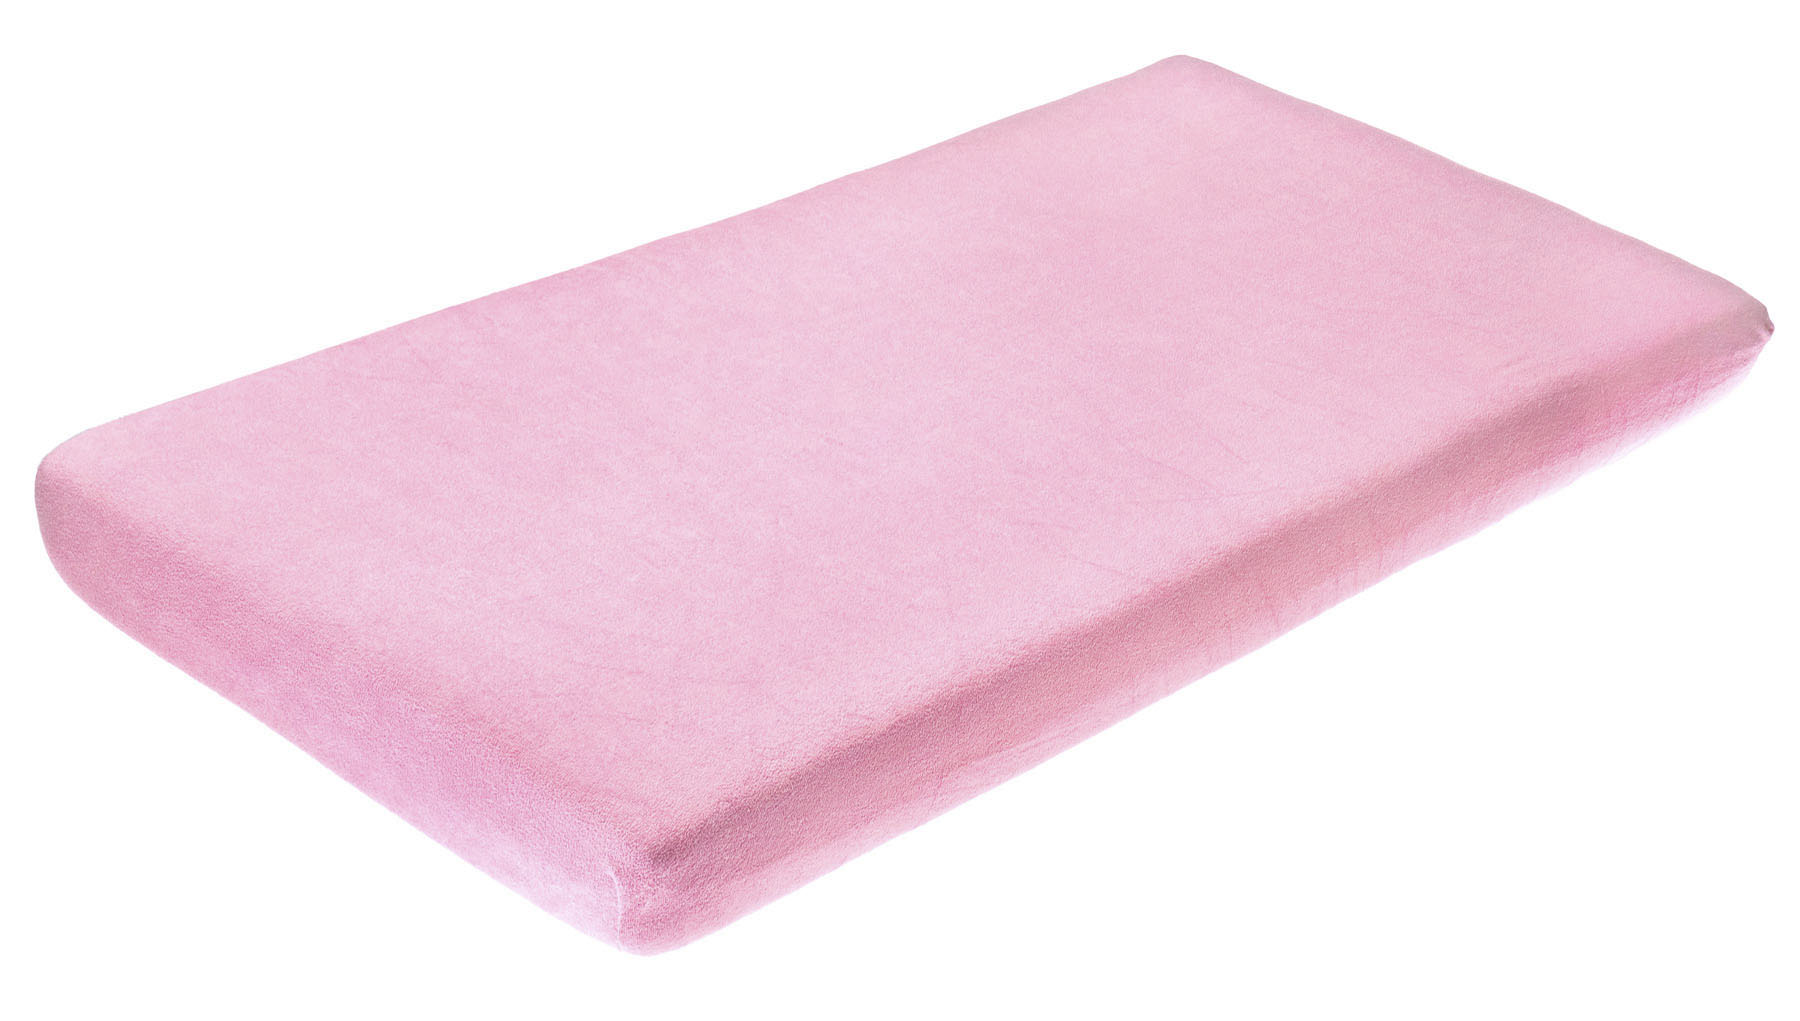 Waterproof Sheet – pink